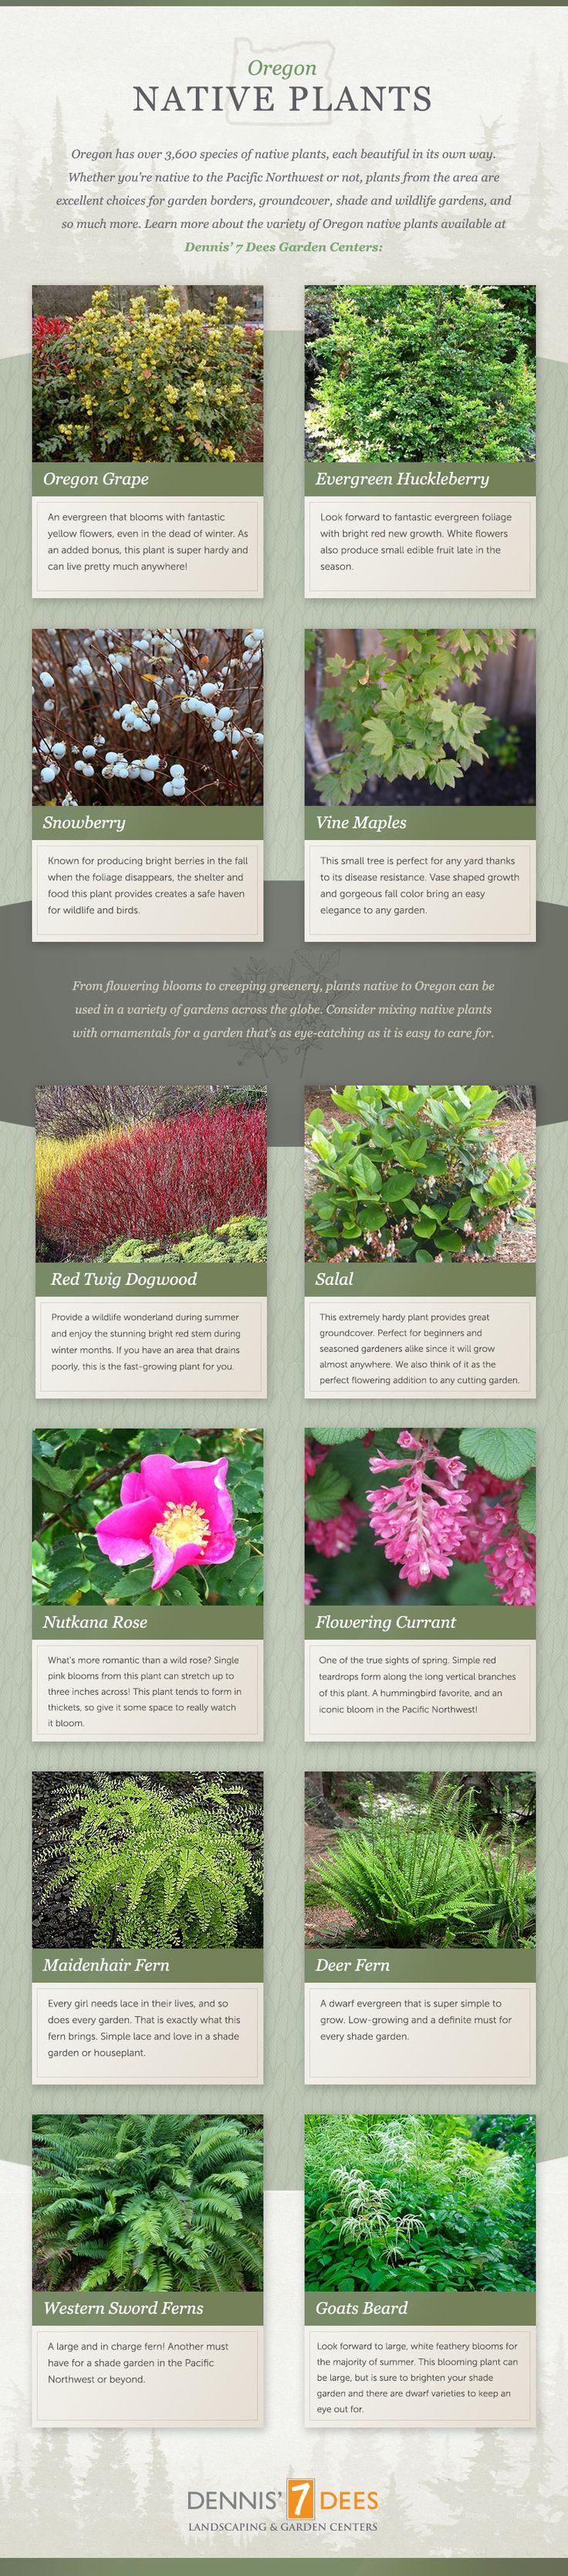 Oregon Native Plants | Portland Nursery | Dennis' 7 Dees | Dennis' 7 Dees